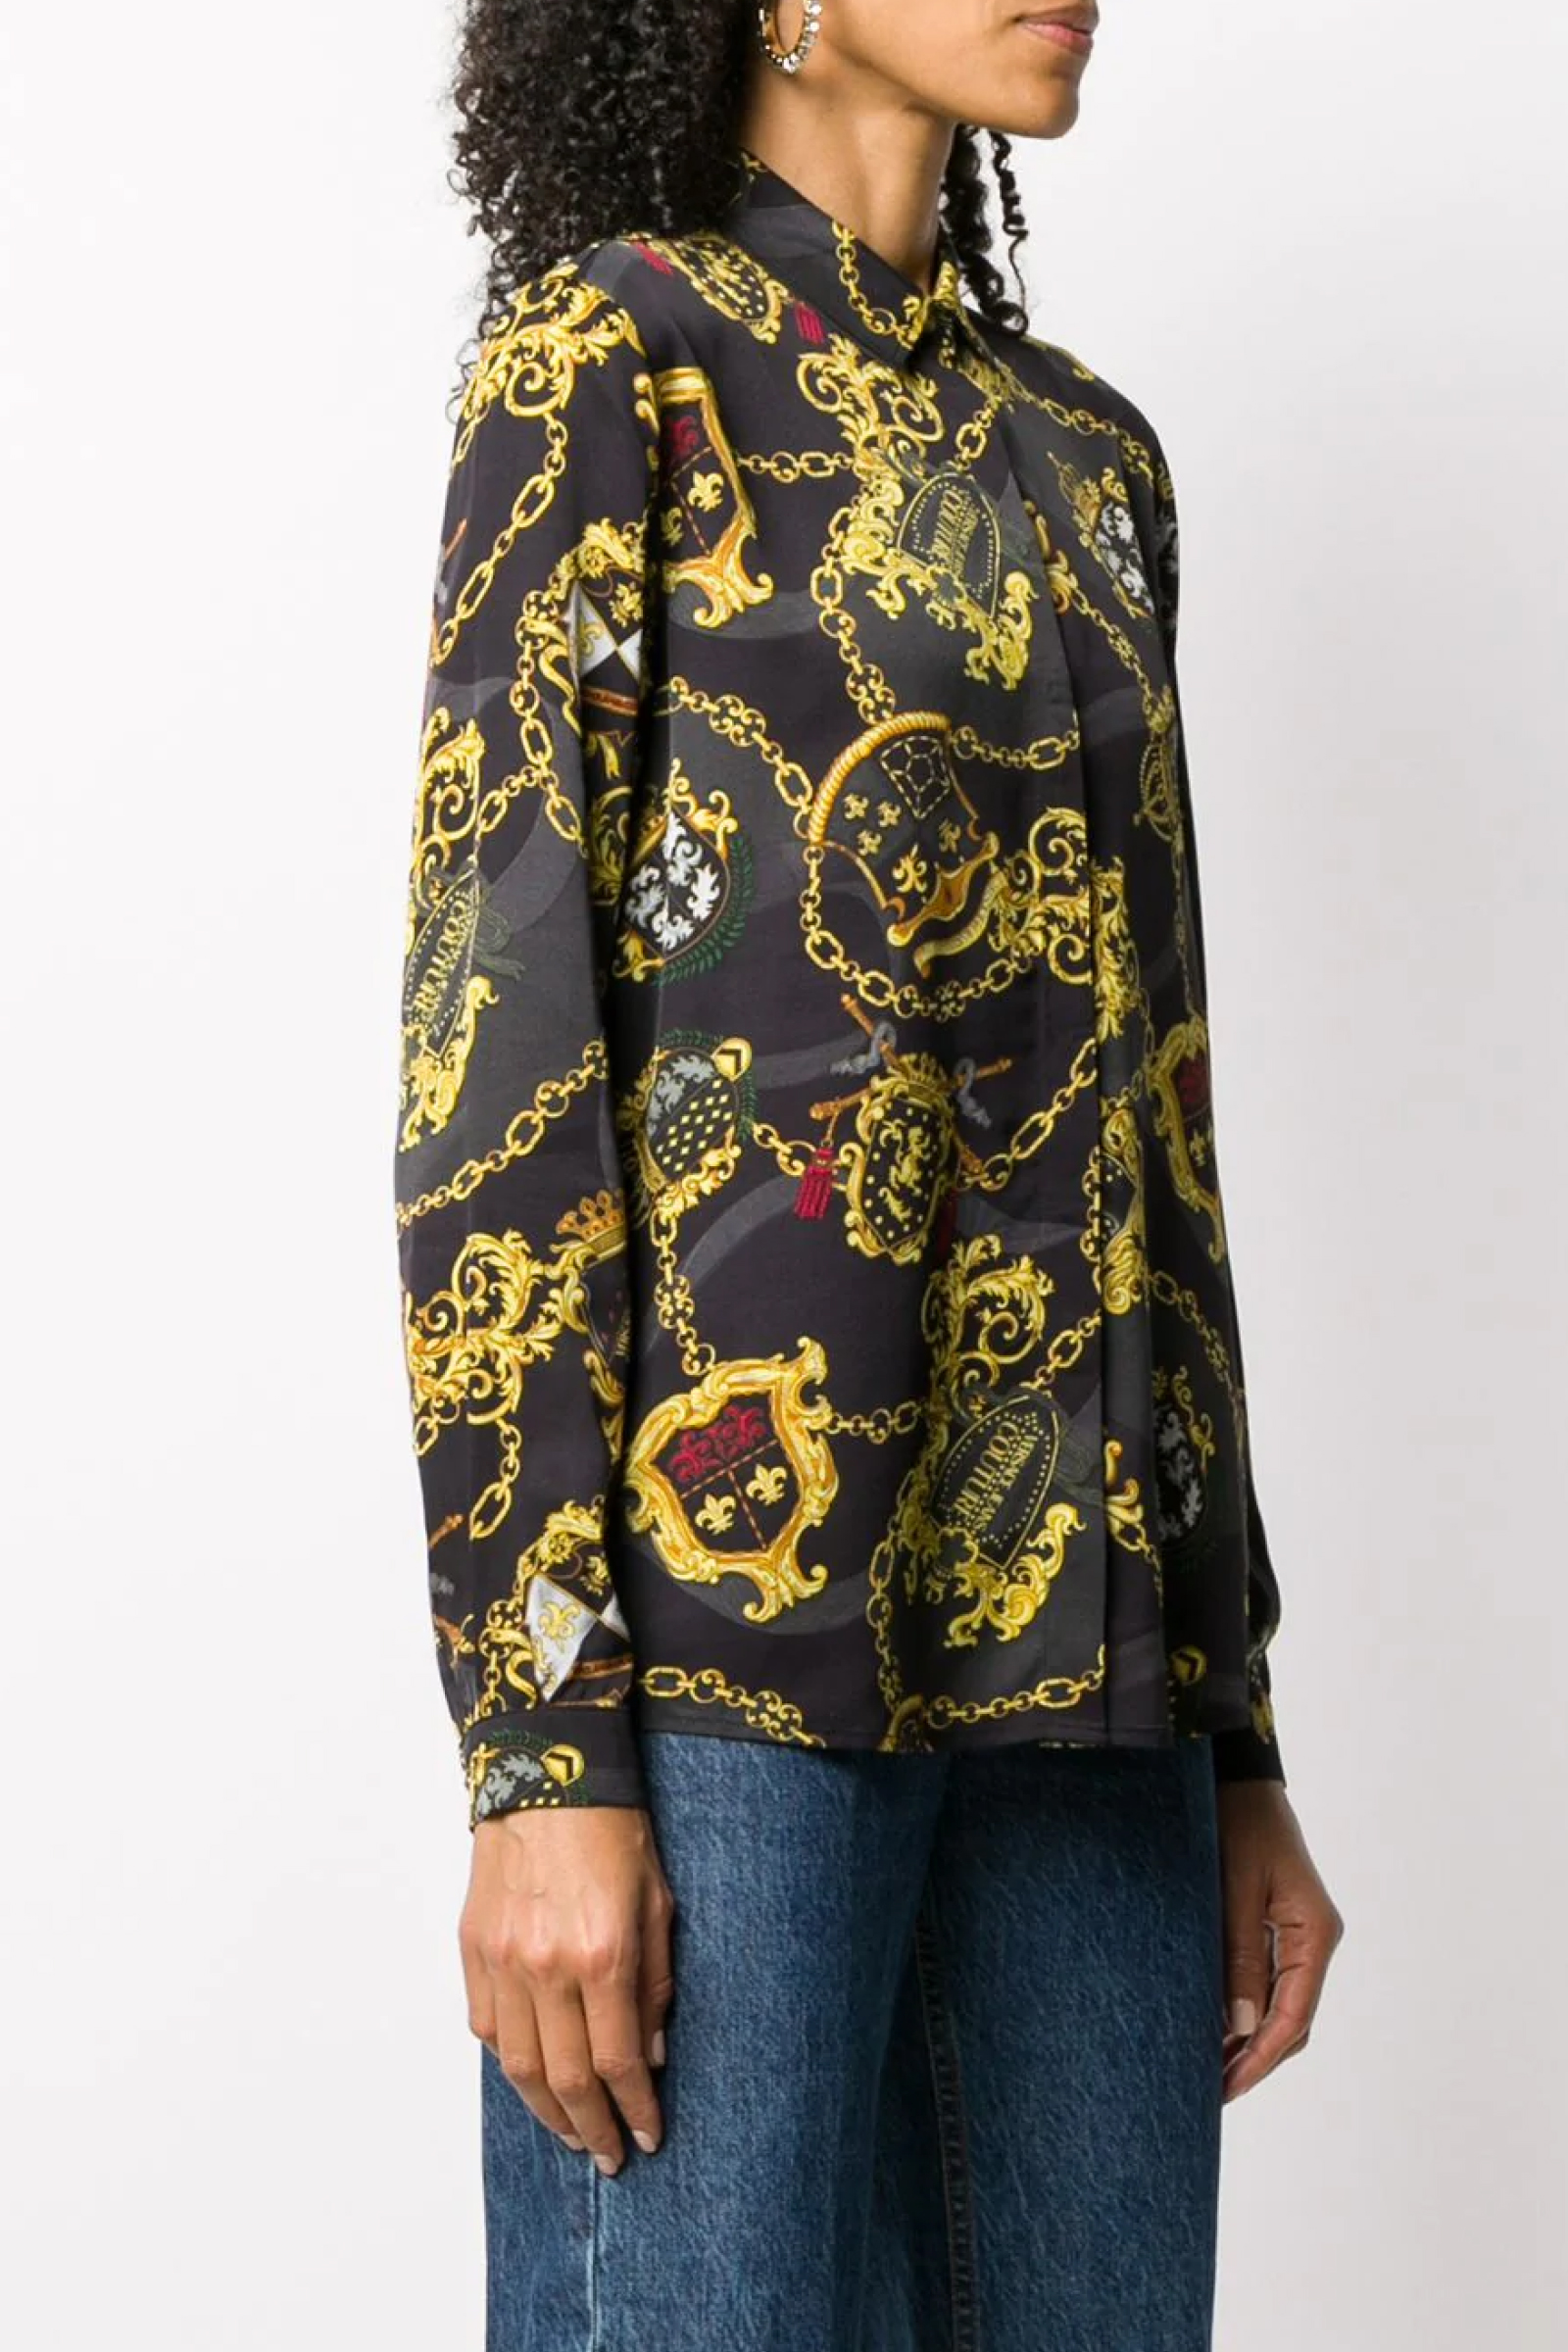 VERSACE JEANS COUTURE Shirt Woman VERSACE JEANS COUTURE | Shirt | B0HZB602.S0931899 ZDM201